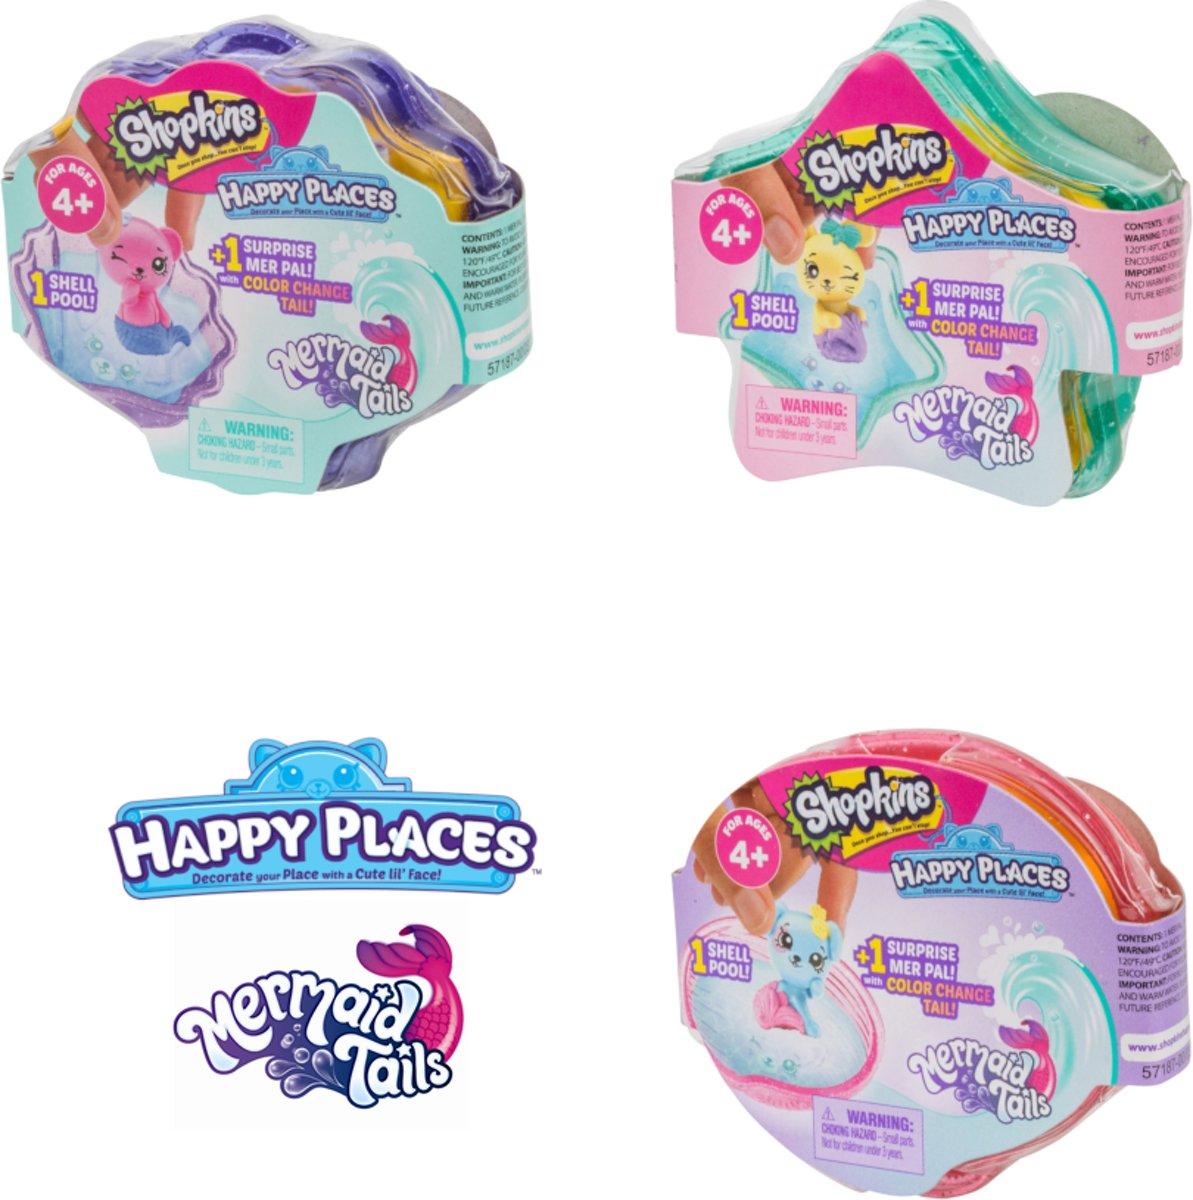 Happy Places - Mystery Pack Season 6 (3 stuks)